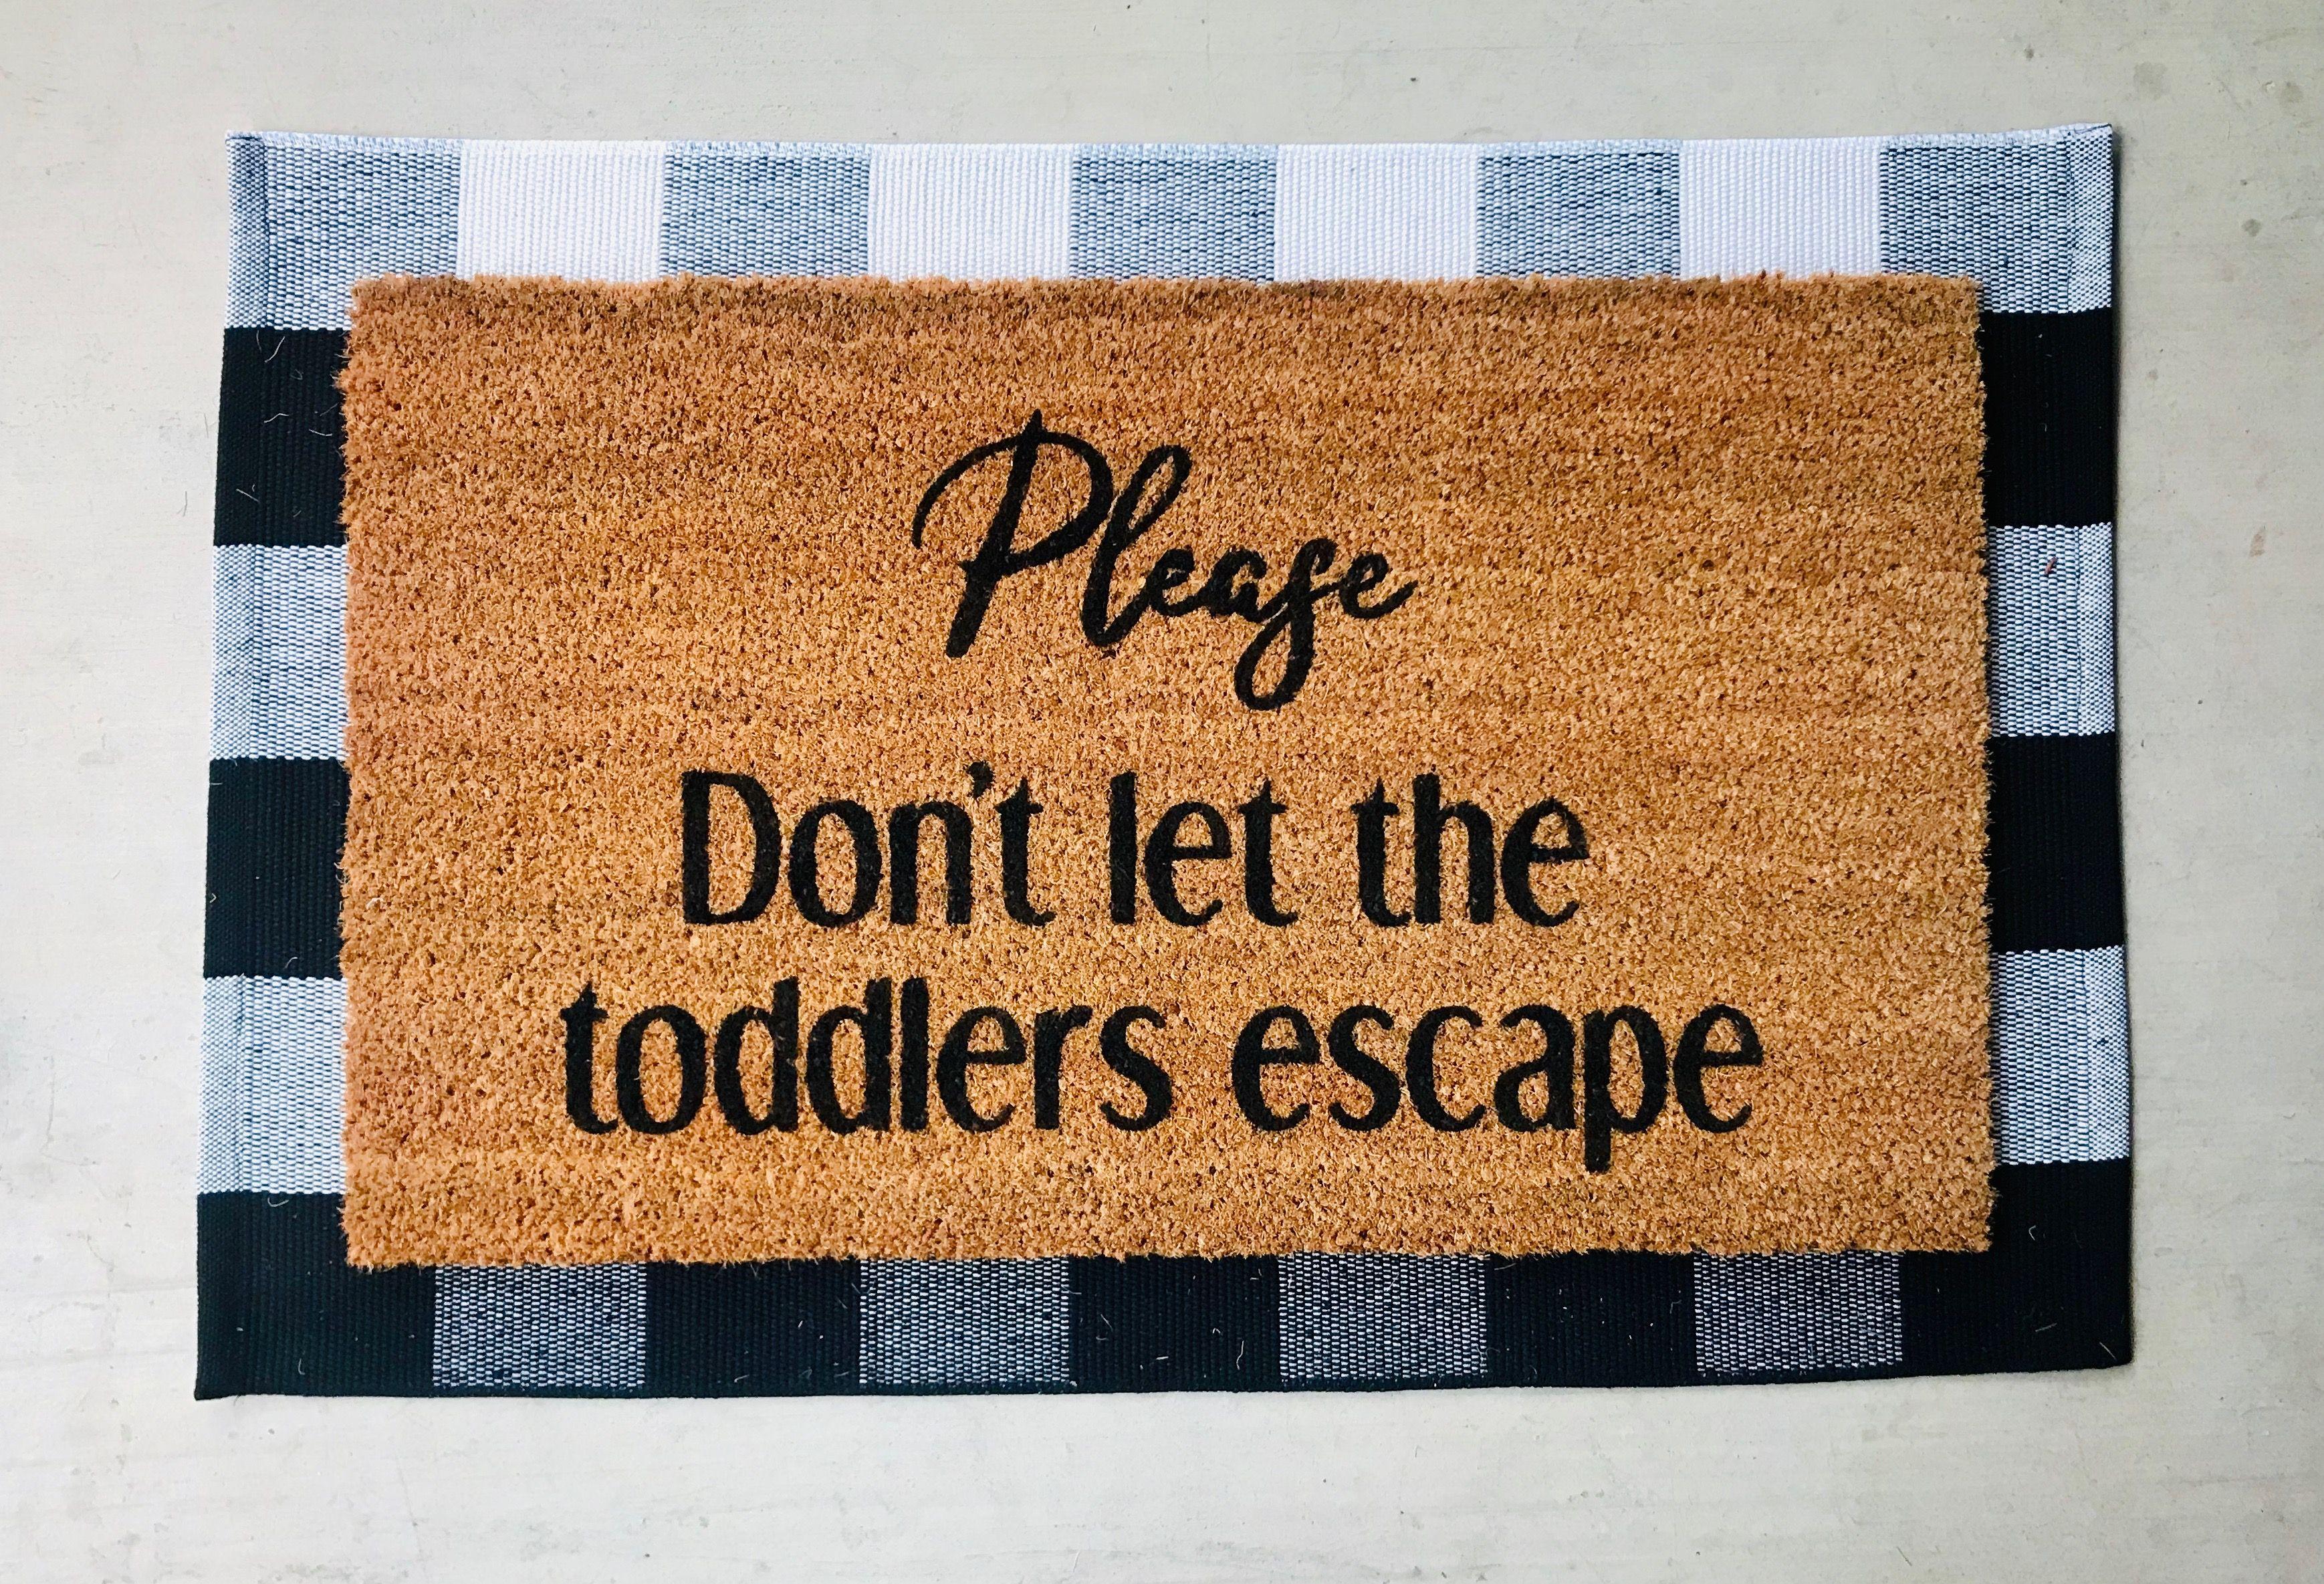 Please Don T Let The Toddlers Escape Doormat Funny Doormat